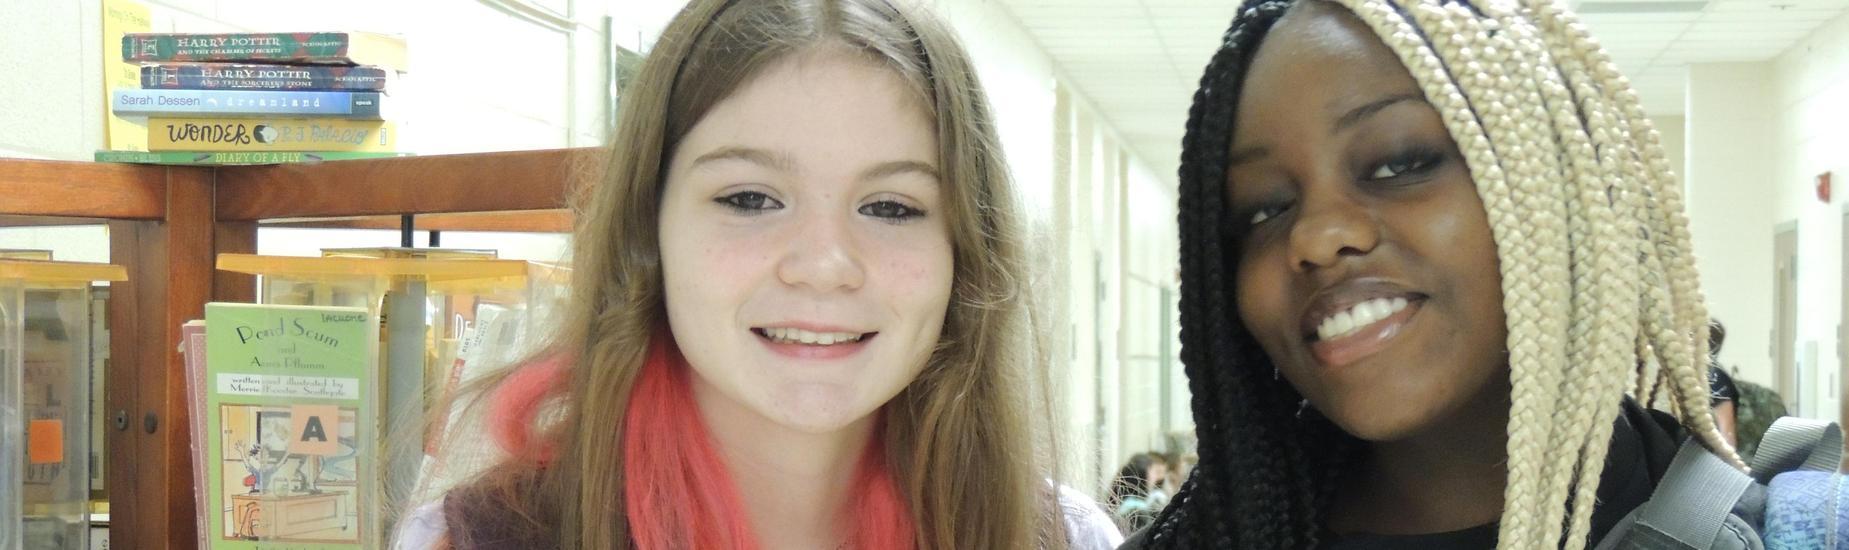 8th grade students